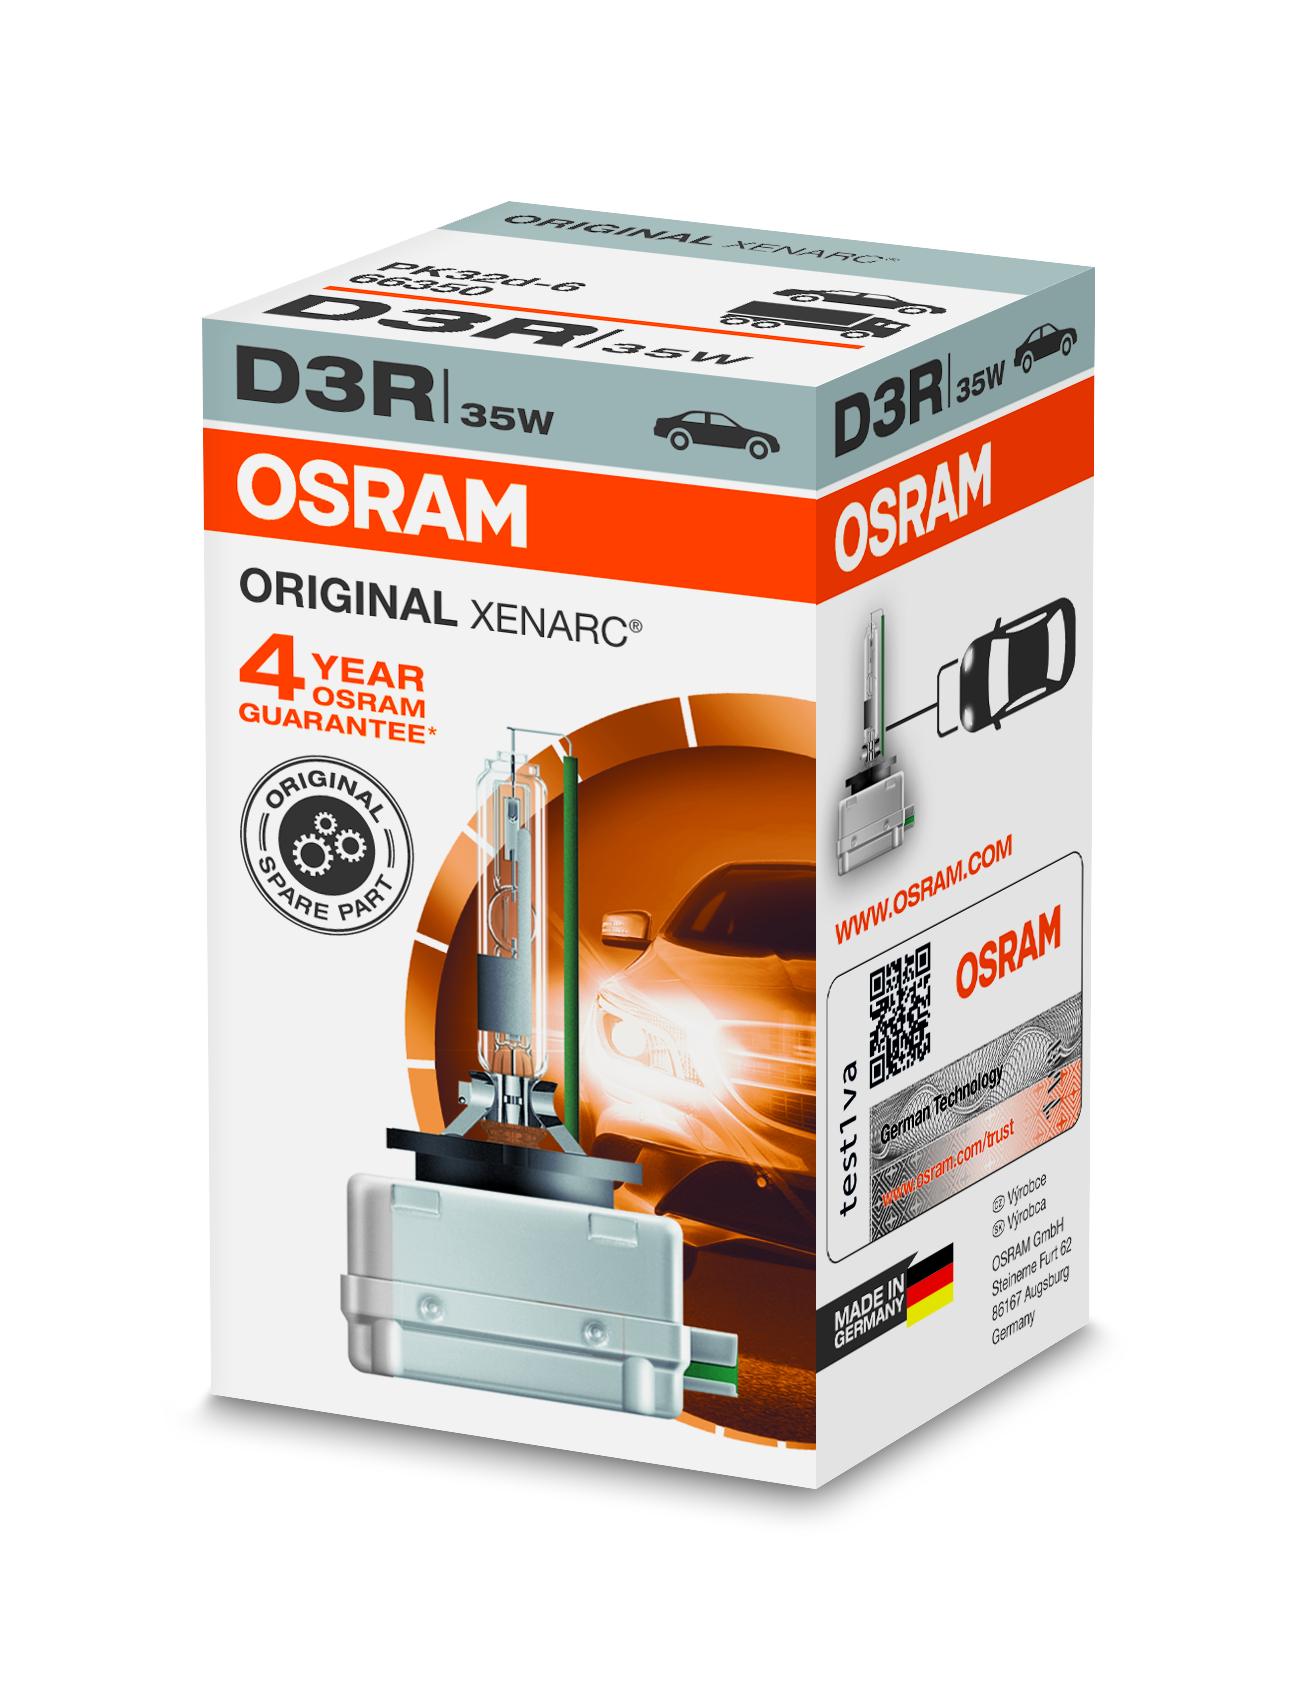 Osram Xenonová výbojka, XENARC, D3R, PK32-d-6, 12/24V, 35W, 66350